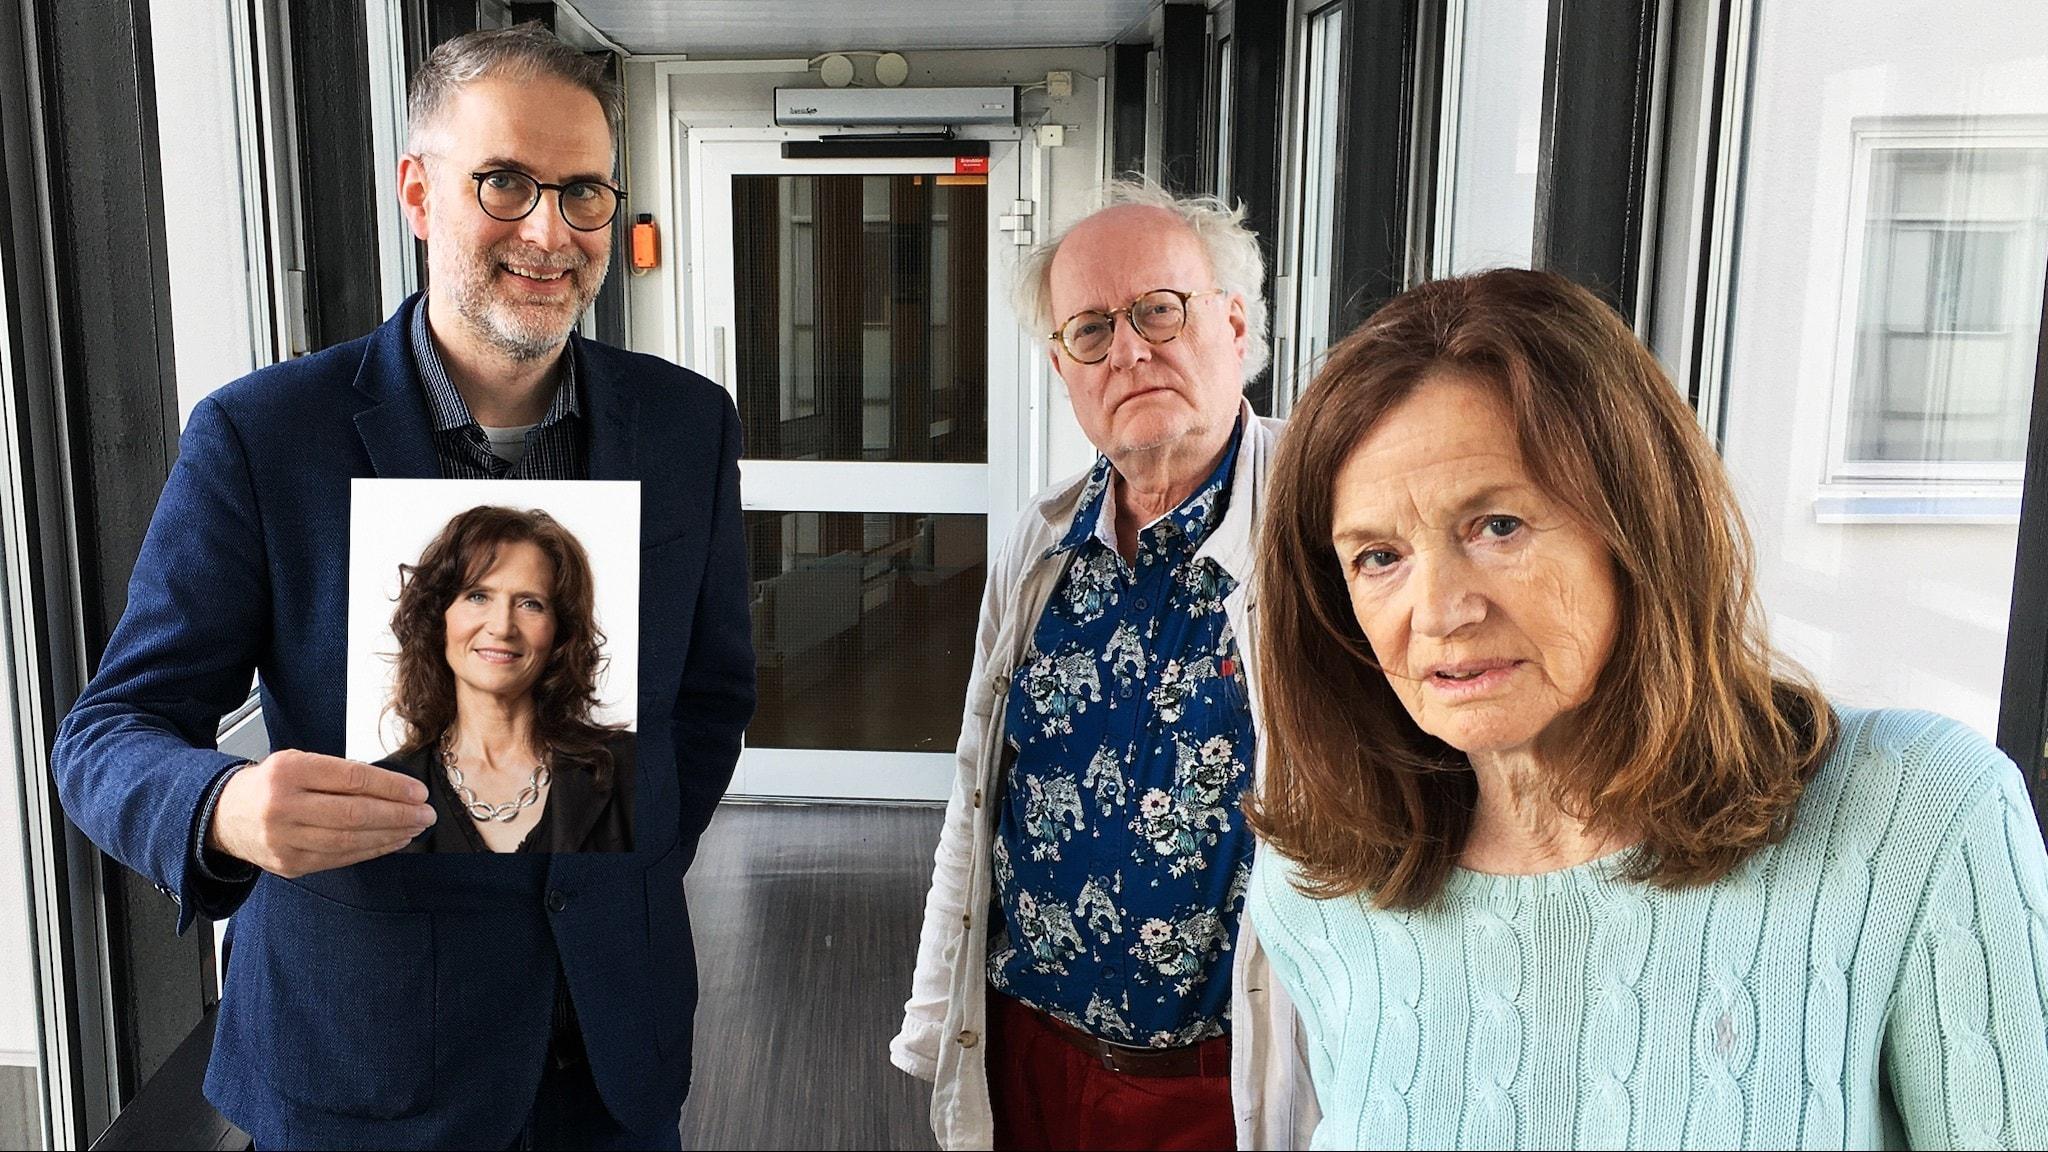 I panelen: pianisten Bengt Forsberg, musikjournalisten Camilla Lundberg, P2-progrmaledaren Boel Adler. Programledare är Johan Korssell.